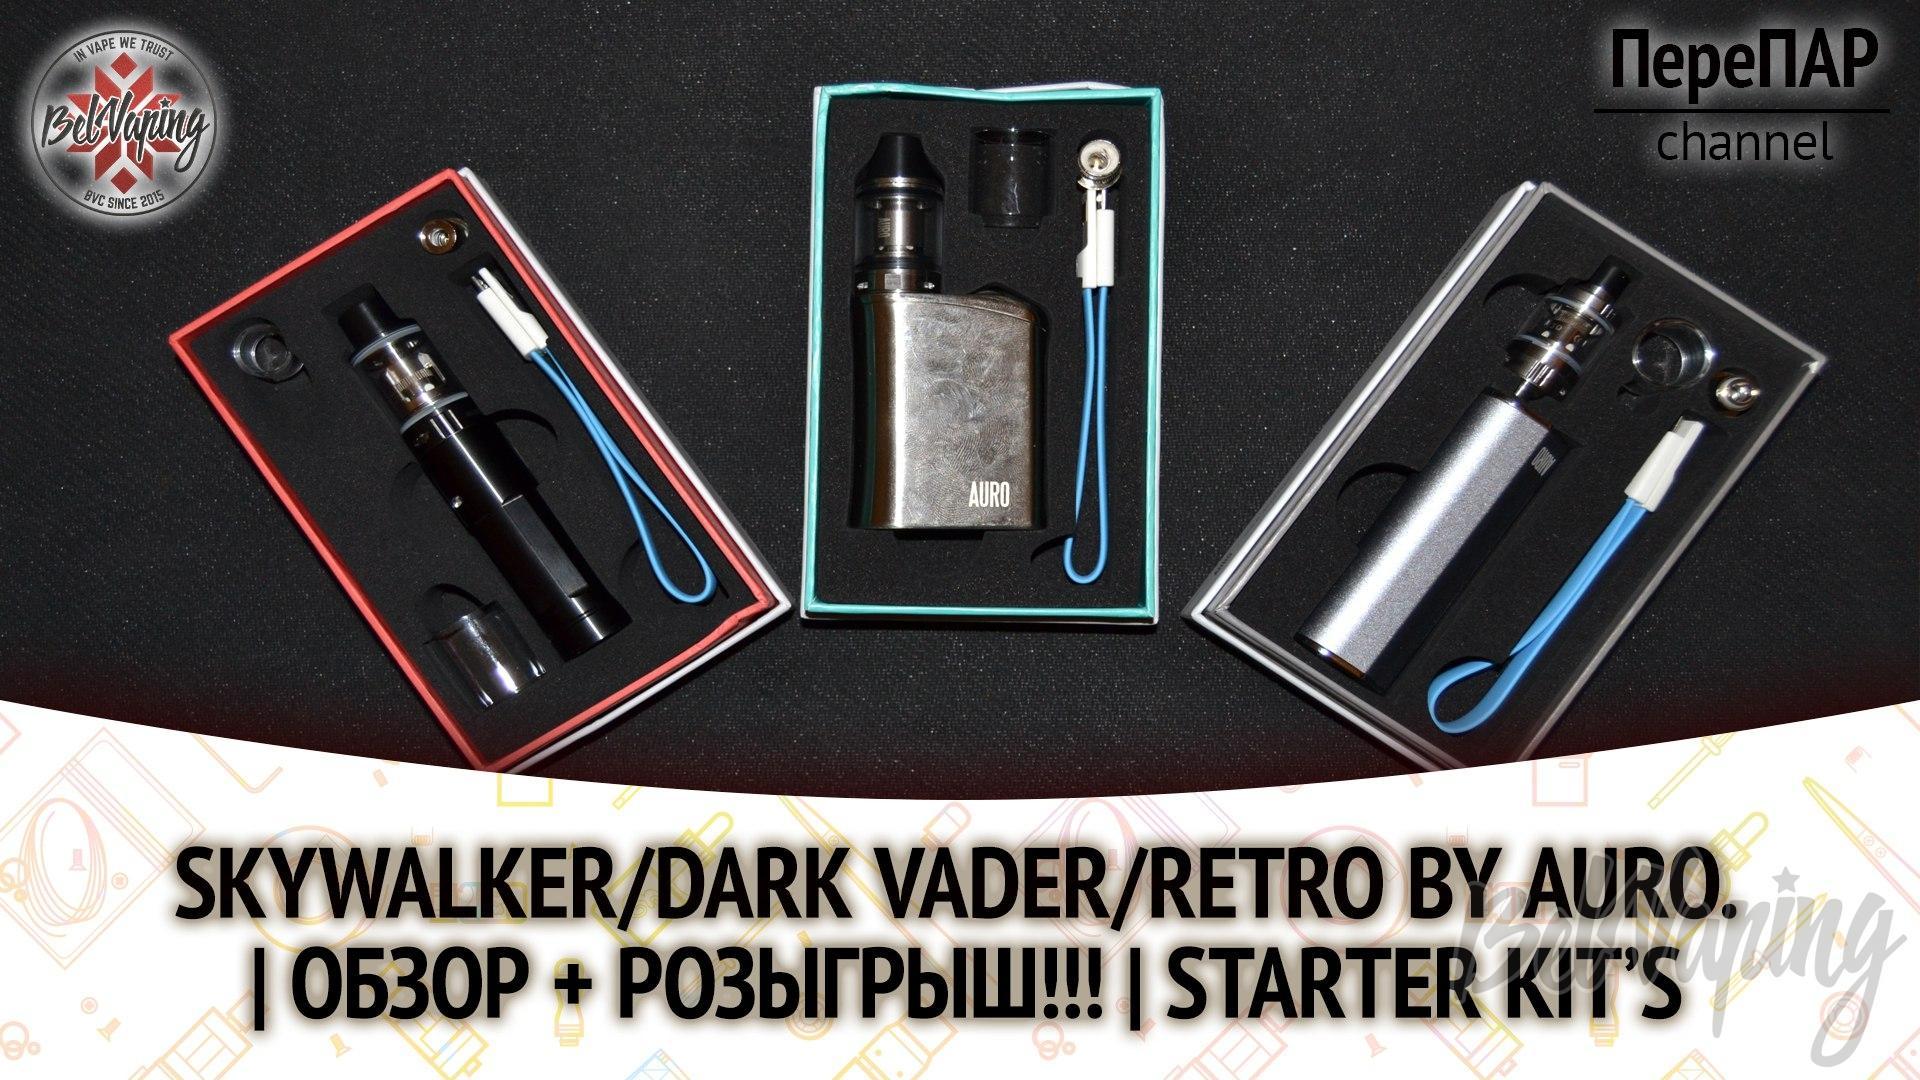 Обзор наборов от Auro: Skuwalker Kit, Dark Vader Kit и Retro Kit